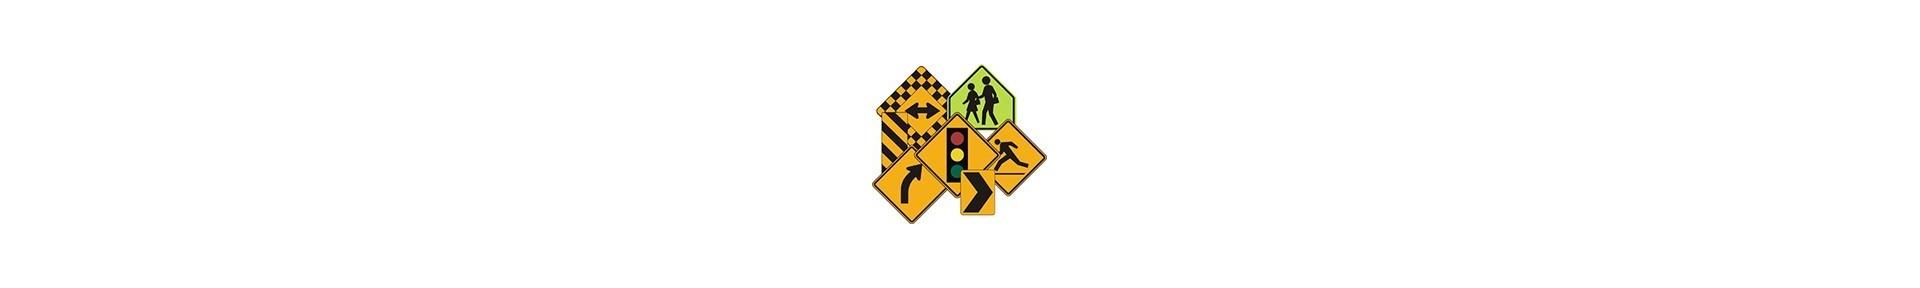 Ontario Traffic Manual Road Signs